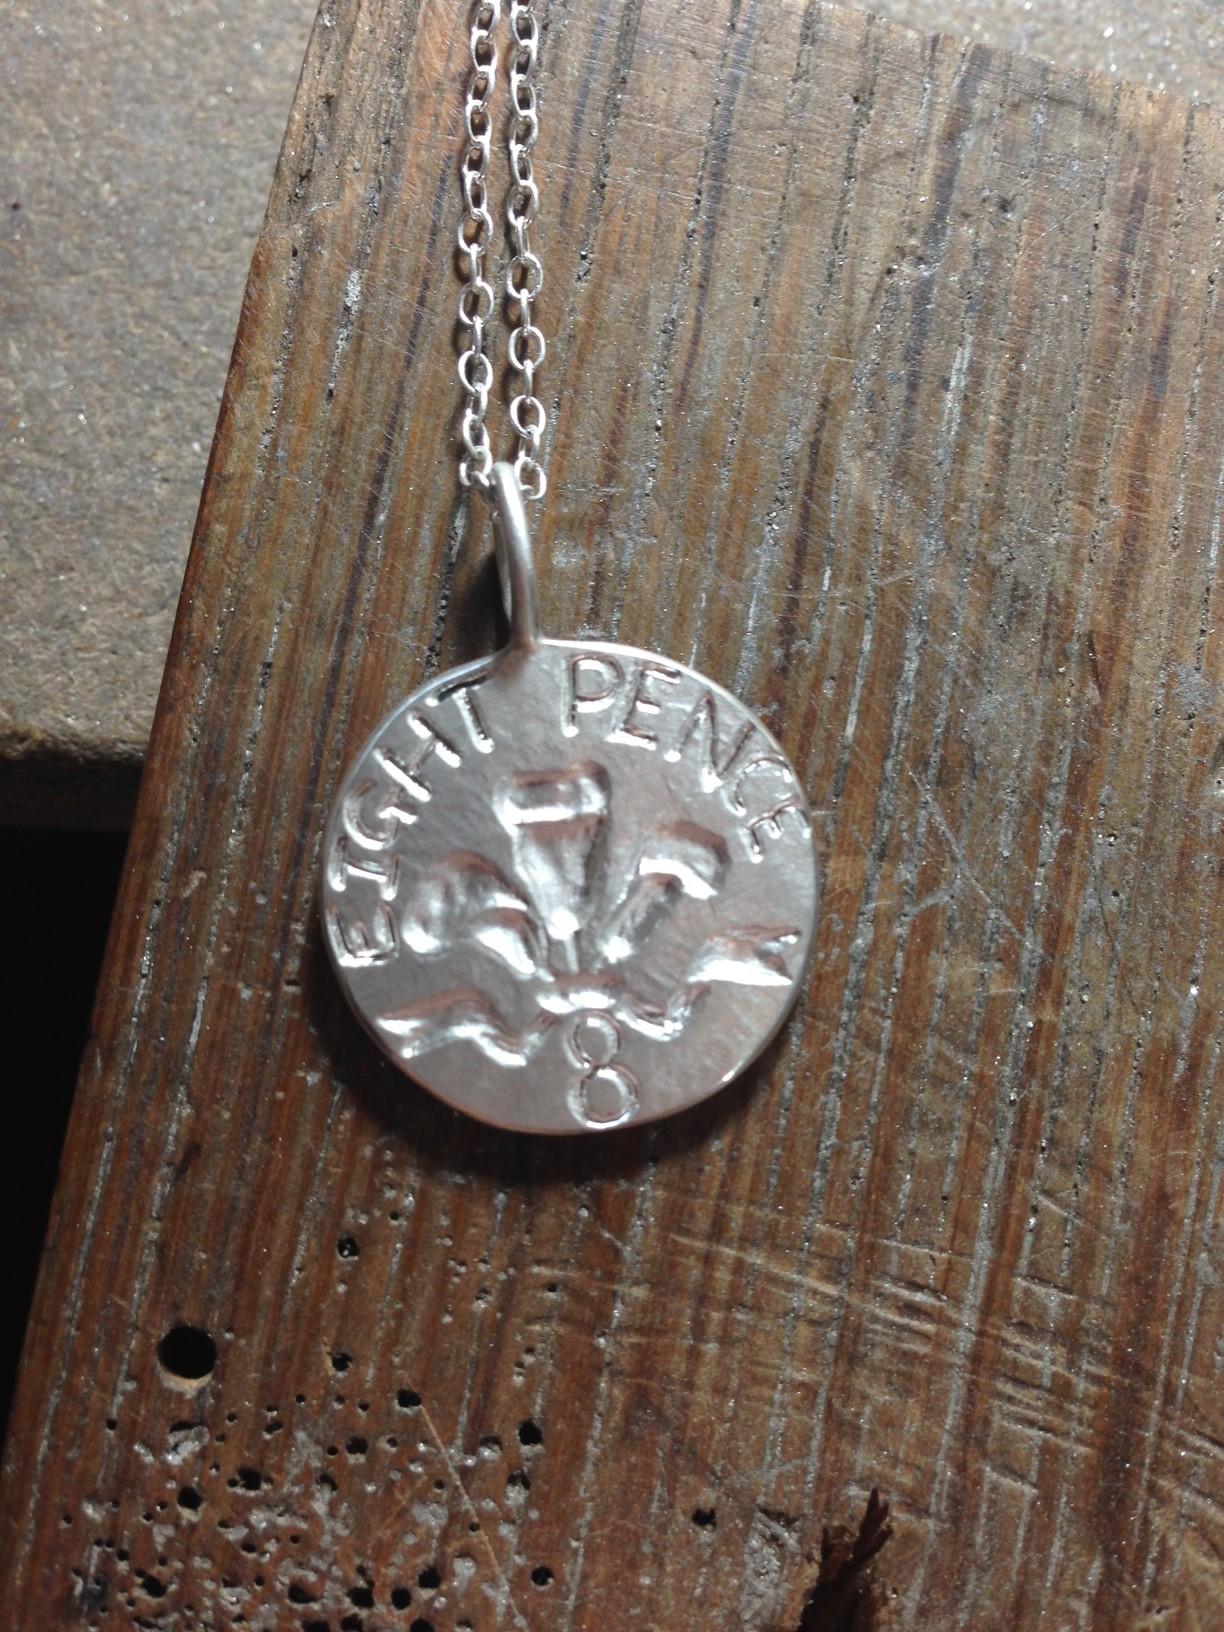 8 pence necklace.JPG